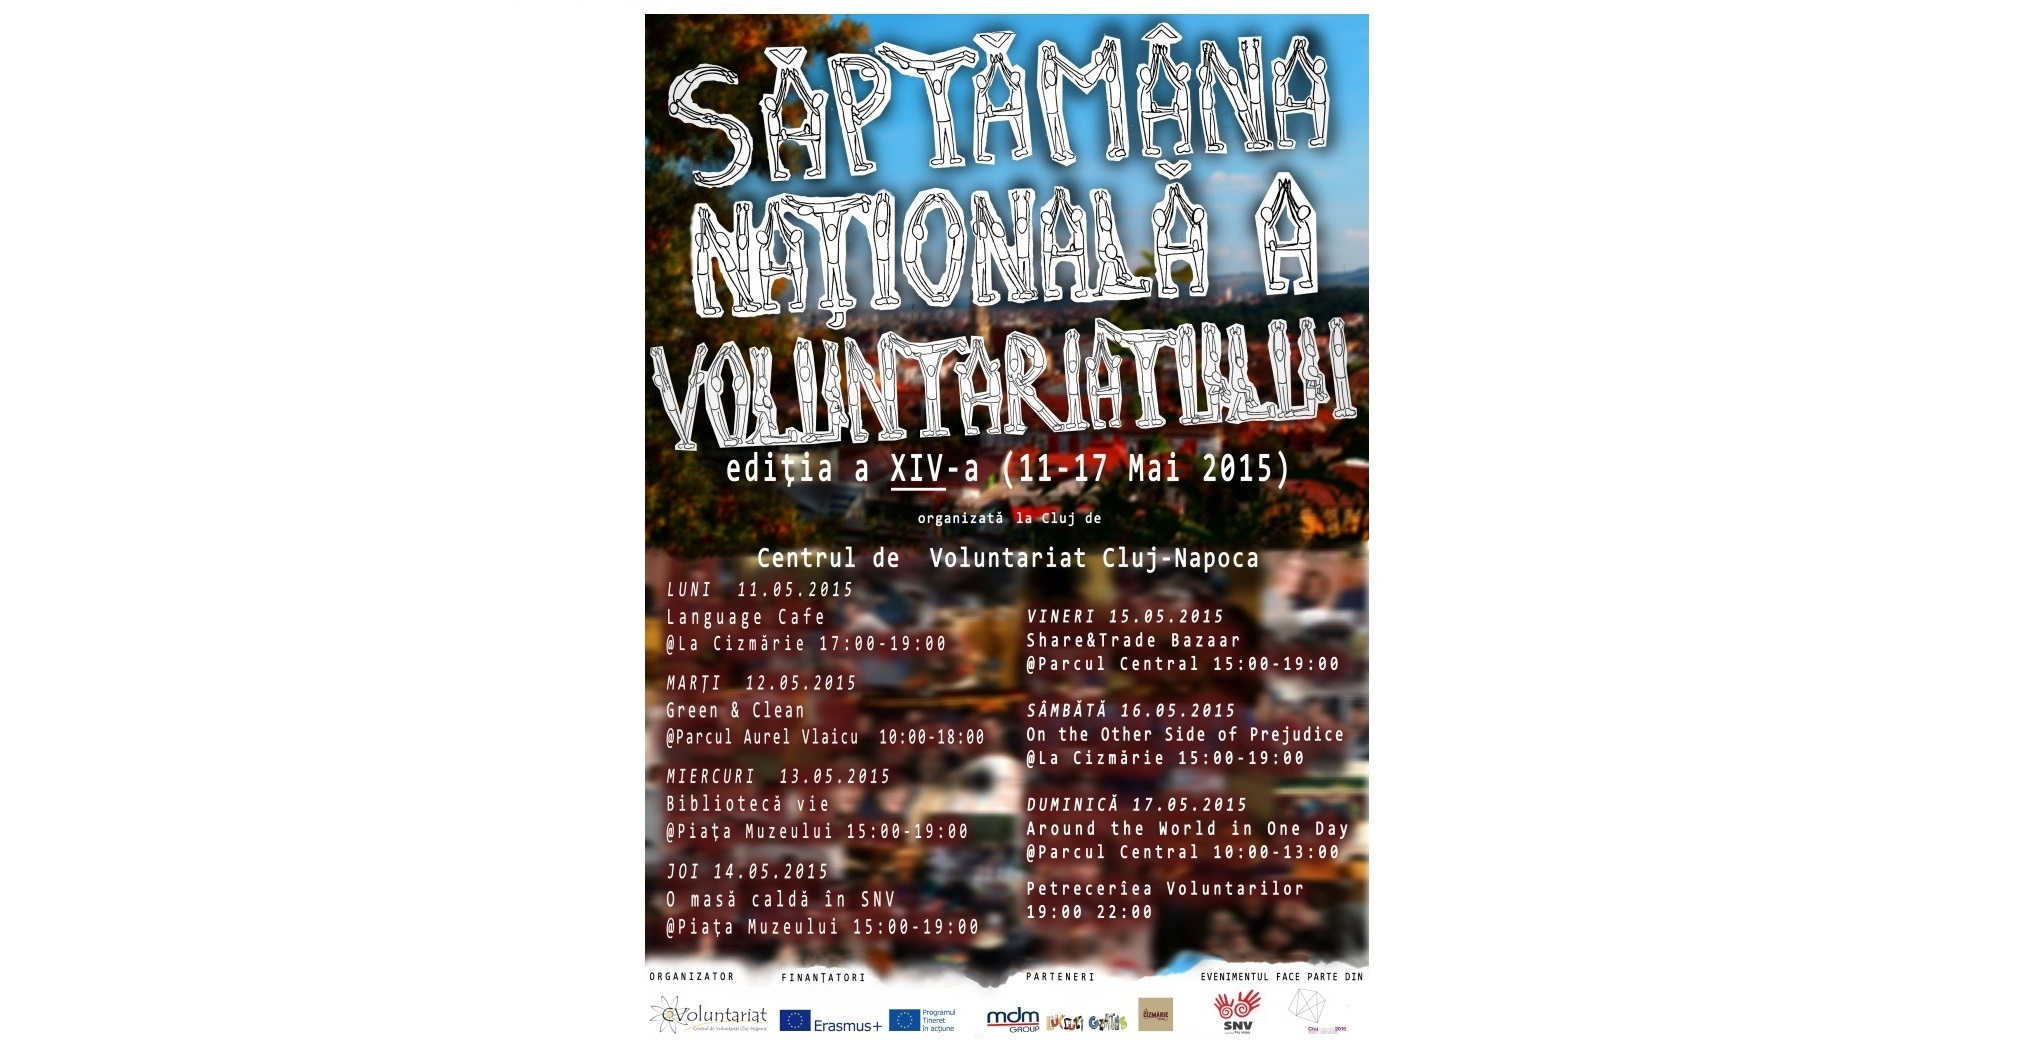 poster SNV 2015 3